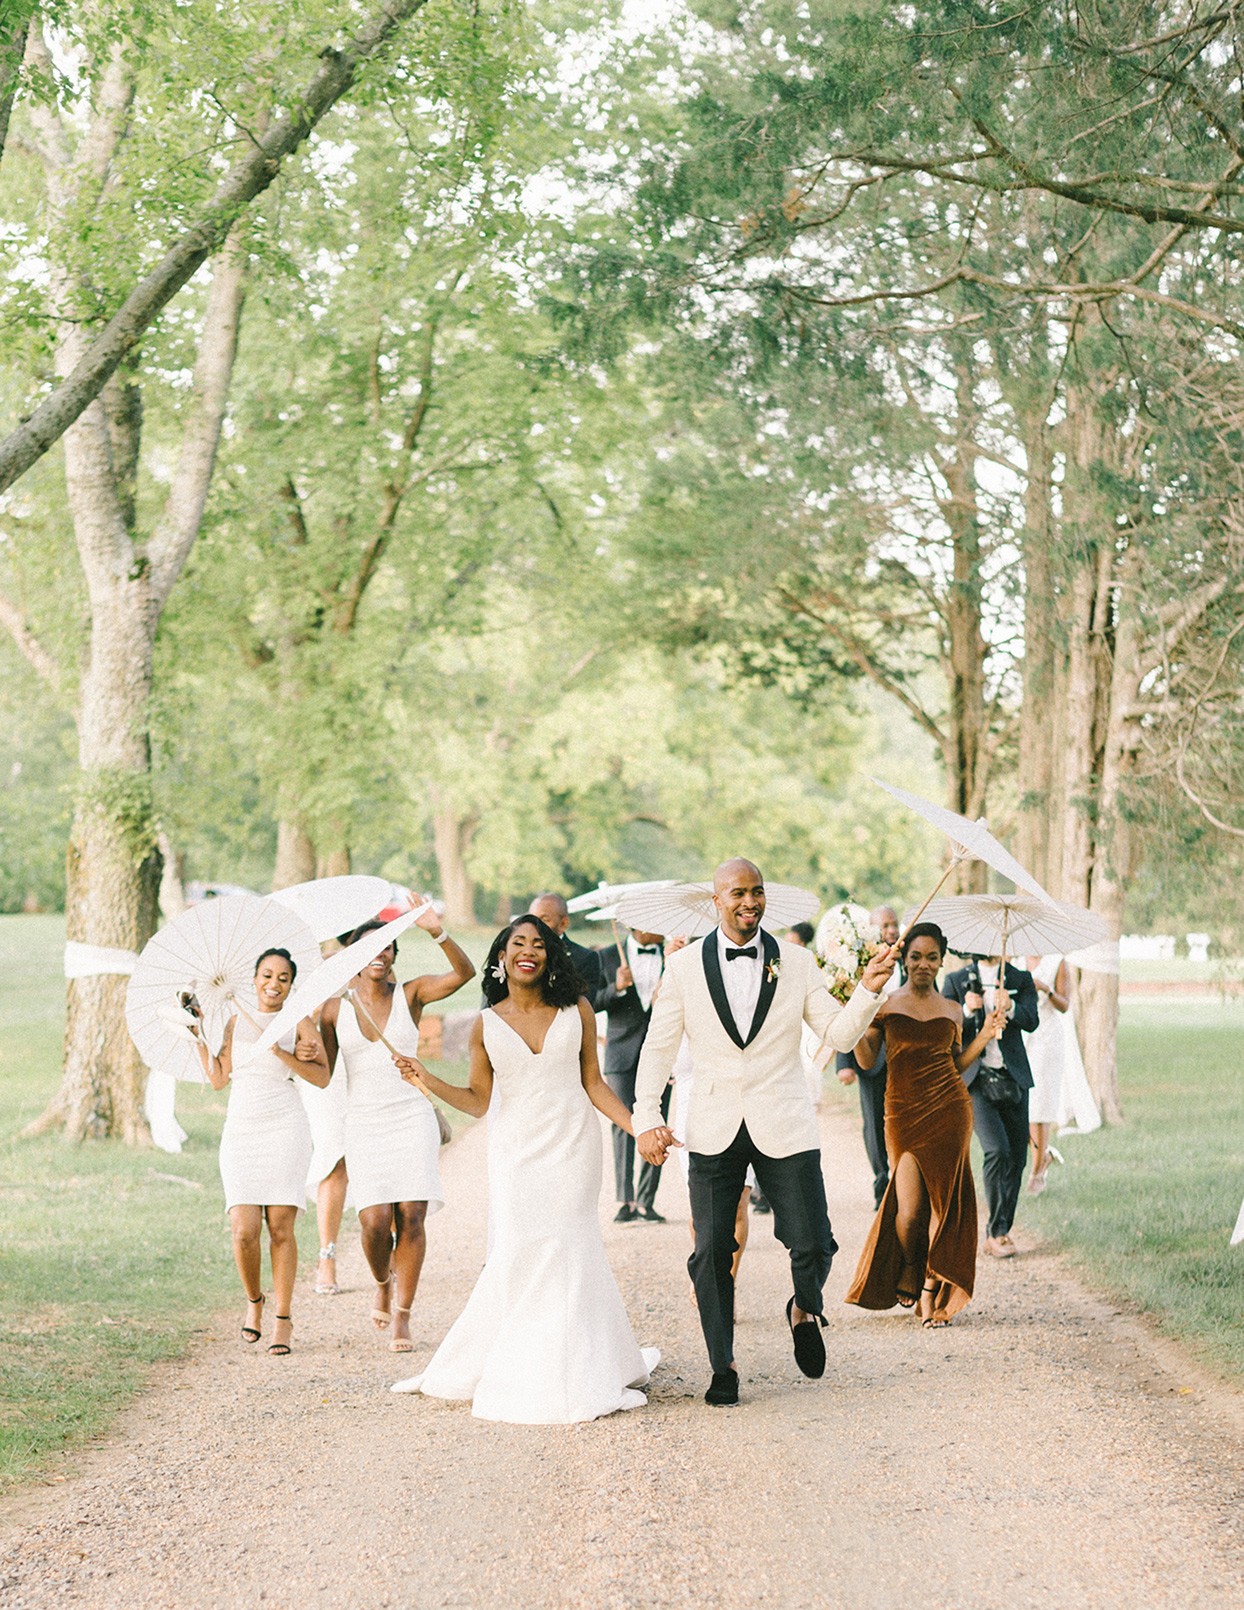 ericka meechaeyl wedding party walking with umbrellas